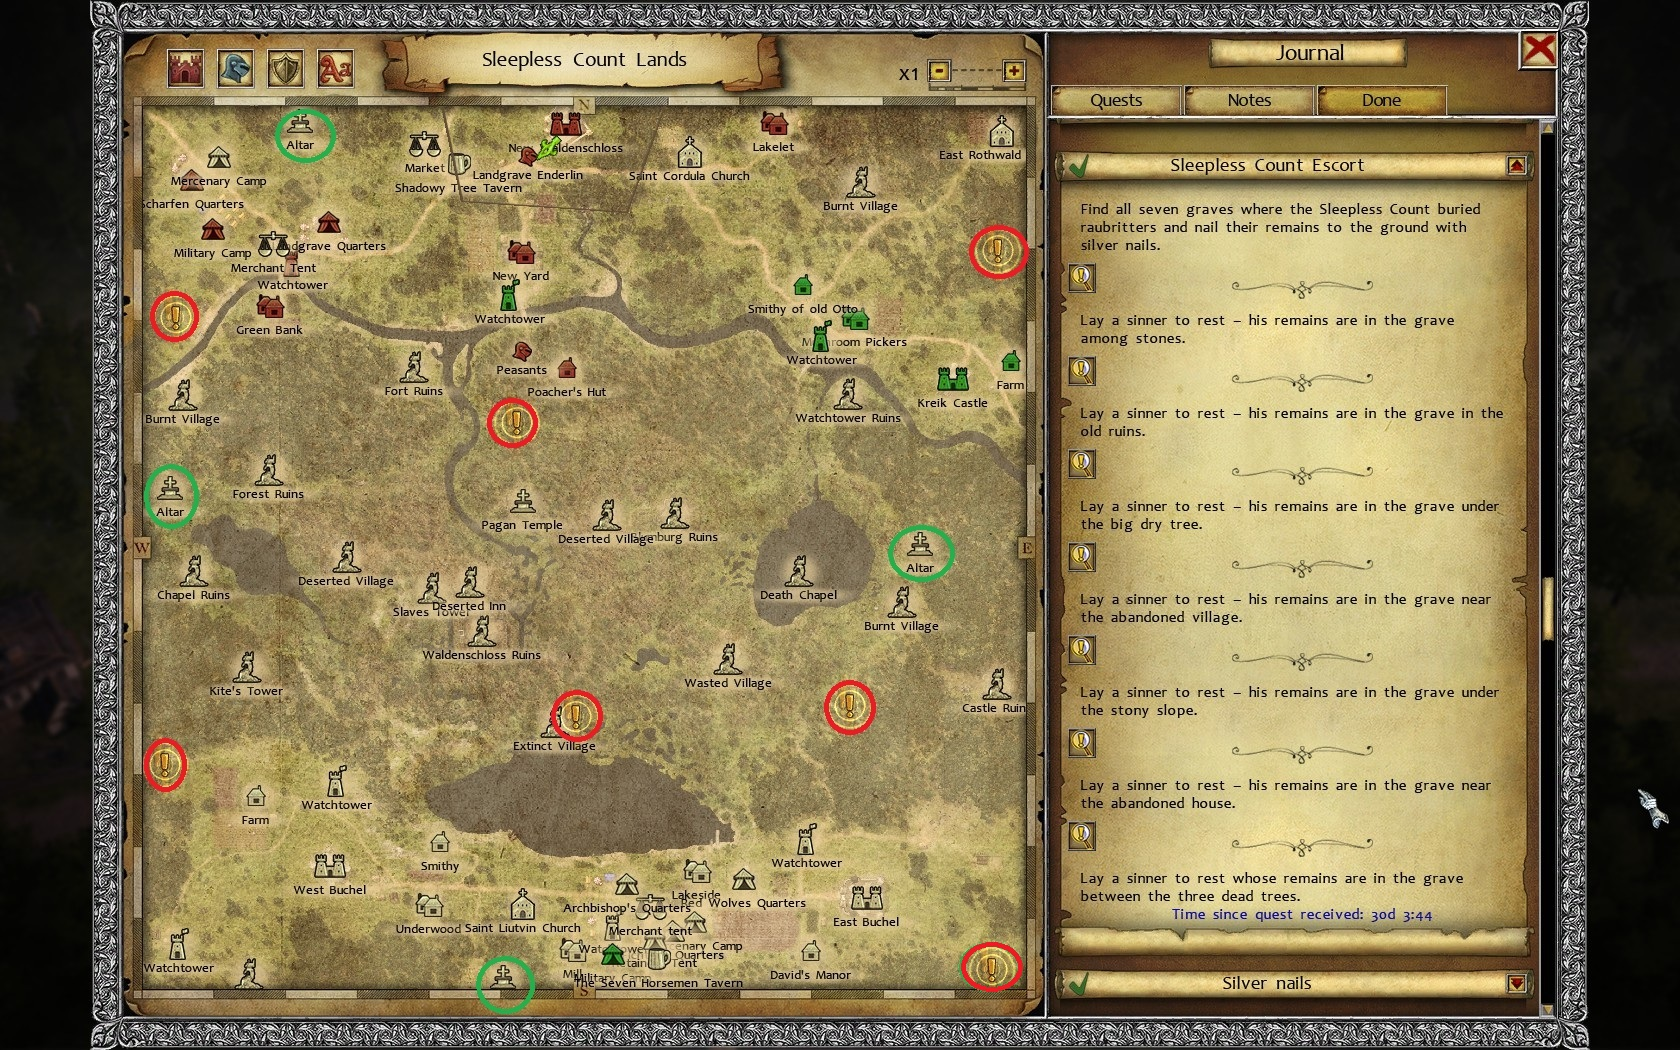 Steam Community :: Guide :: Legends of Eisenwald